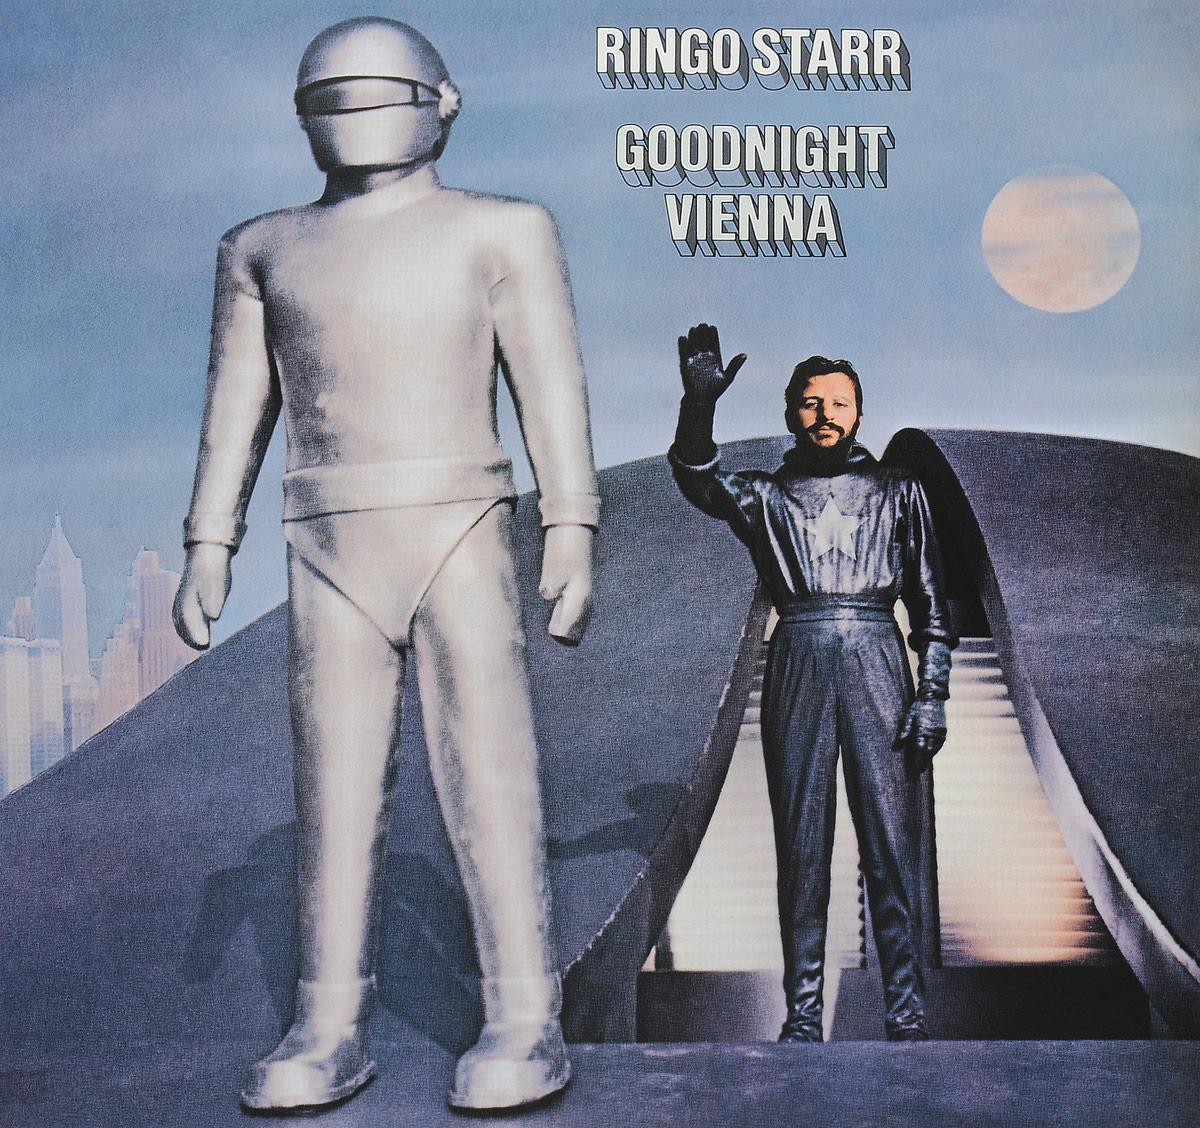 Ринго Старр Ringo Starr. Goodnight Vienna (LP) ringo starr ringo starr postcards from paradise